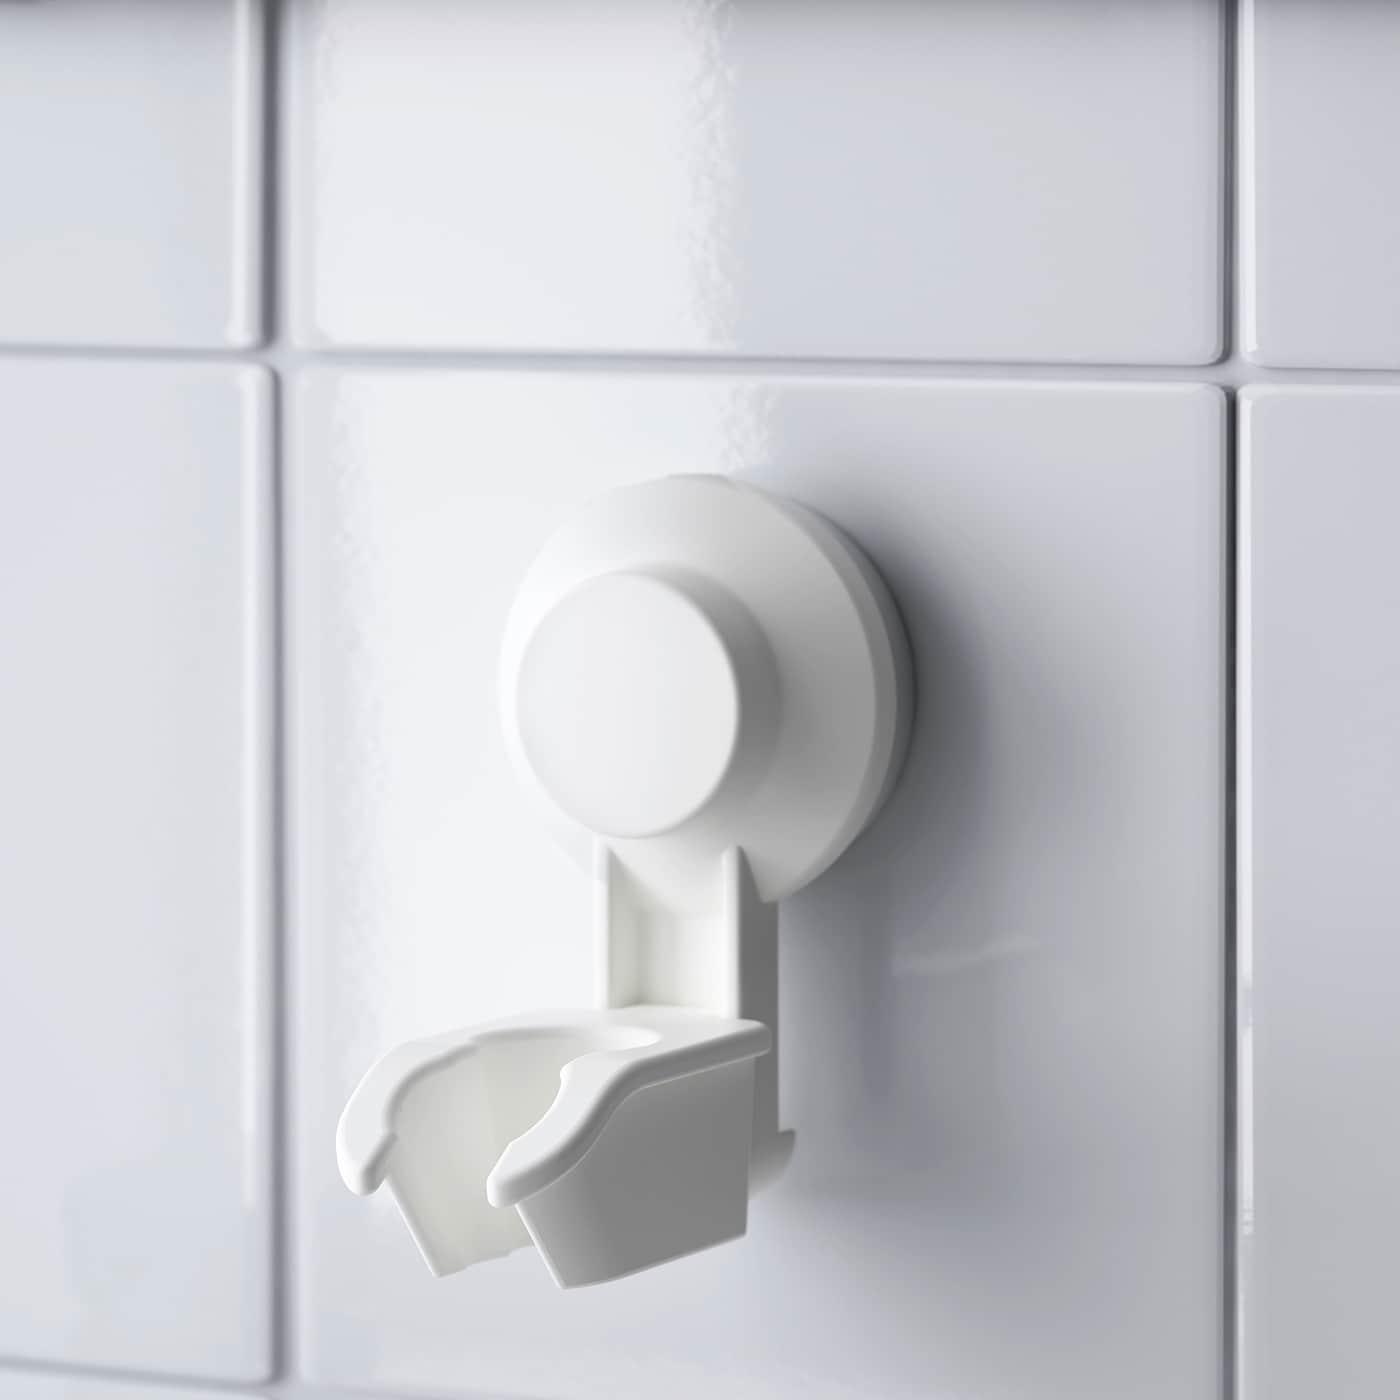 "TISKEN handheld shower holder+suction cup white 2 ¼ "" 3 ¼ "" 4 "" 6 lb 10 oz"